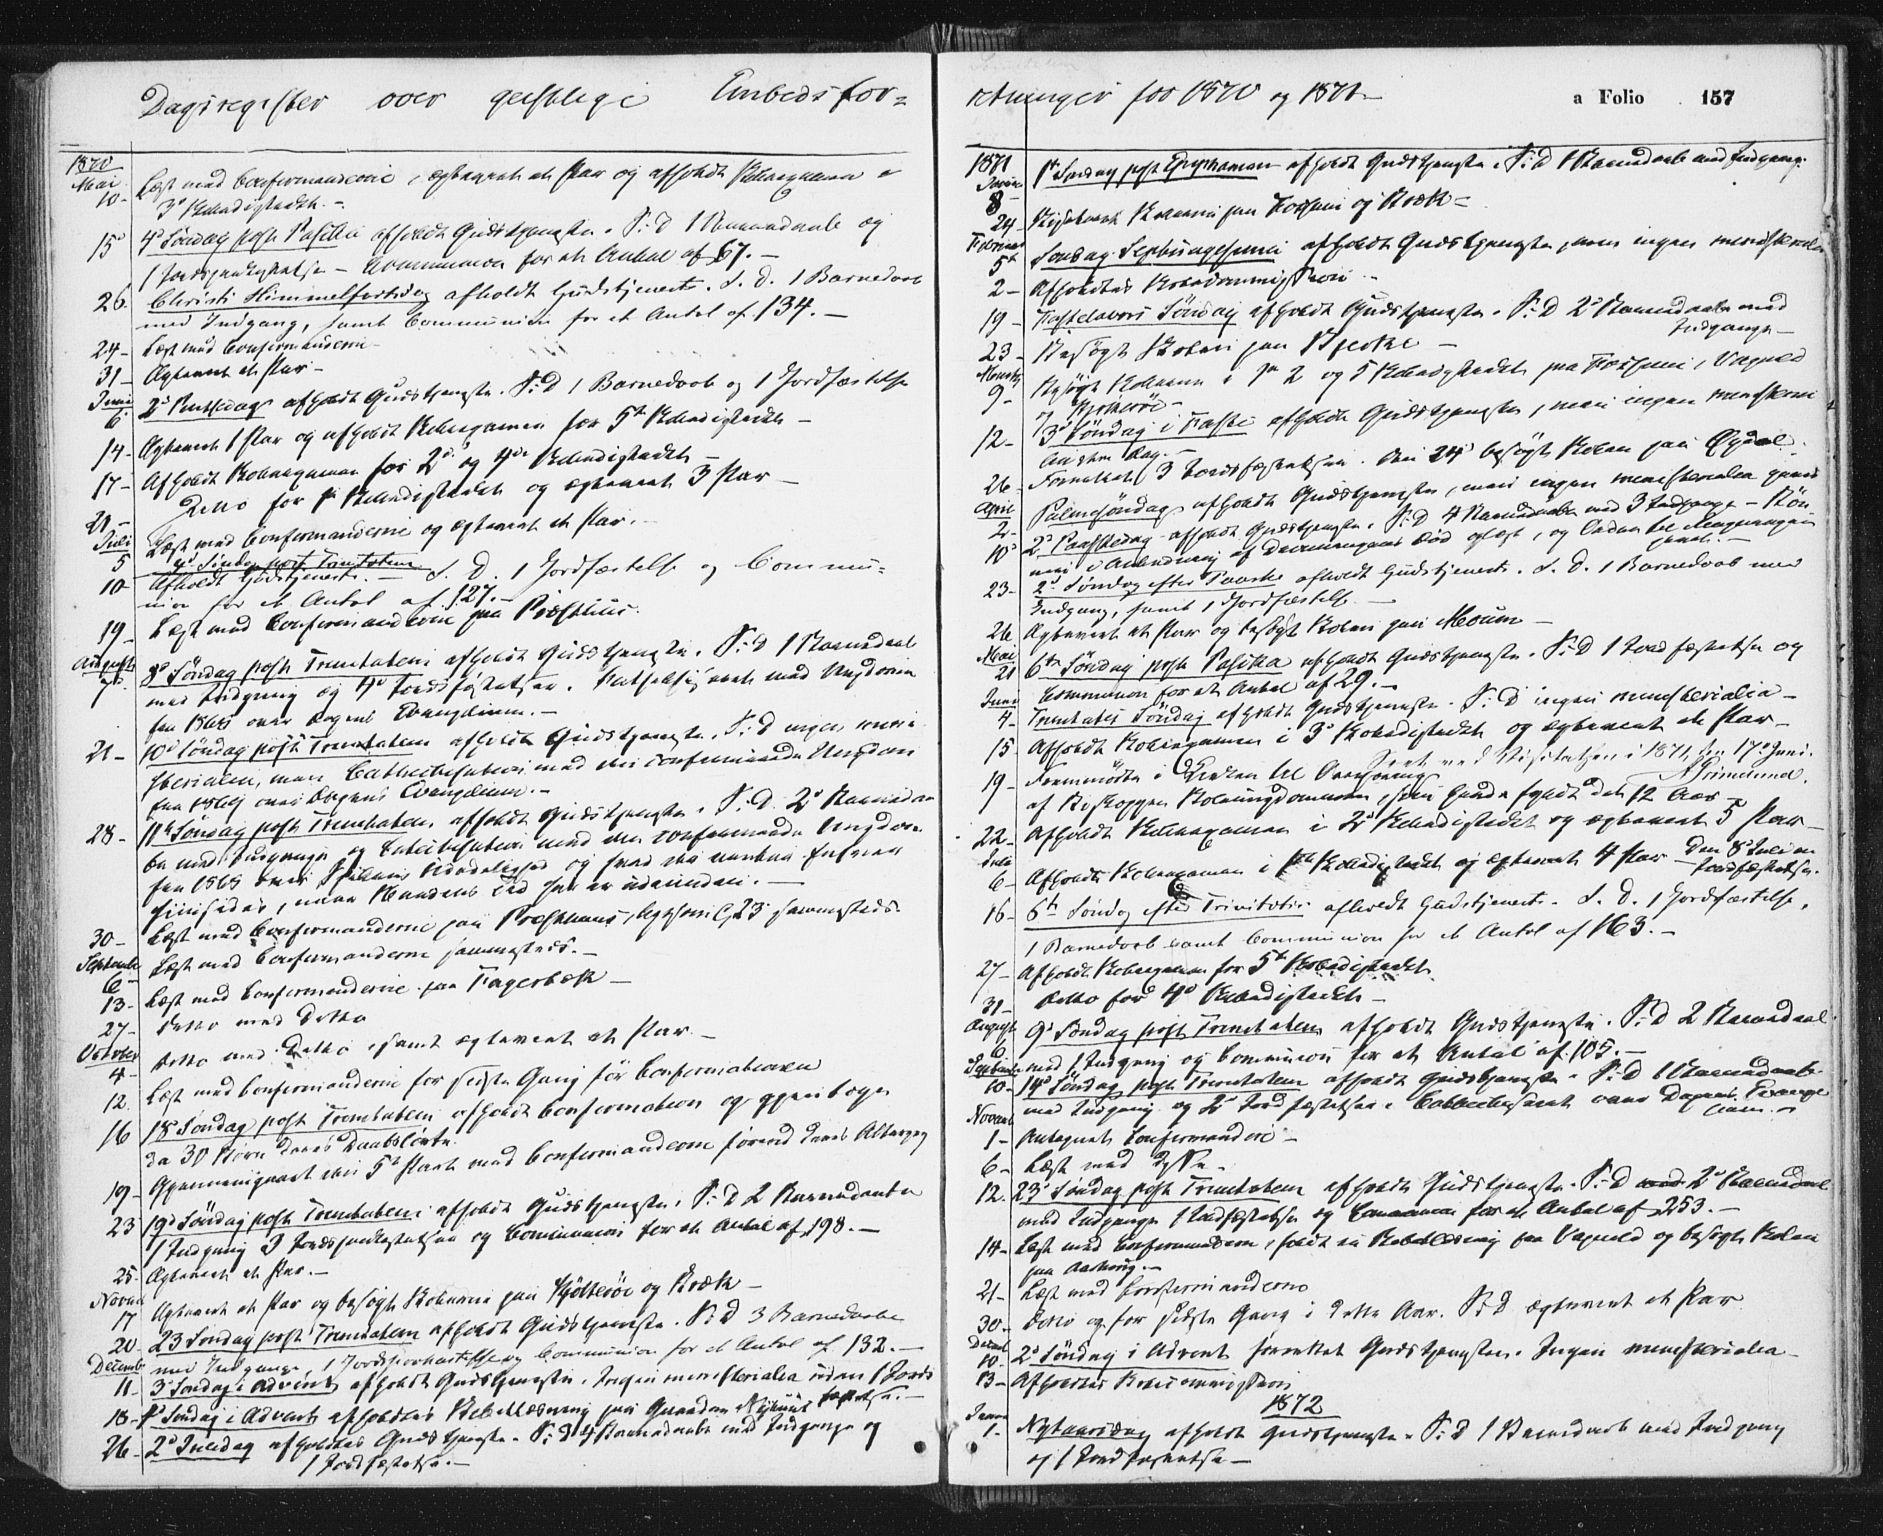 SAT, Ministerialprotokoller, klokkerbøker og fødselsregistre - Sør-Trøndelag, 689/L1039: Parish register (official) no. 689A04, 1865-1878, p. 157